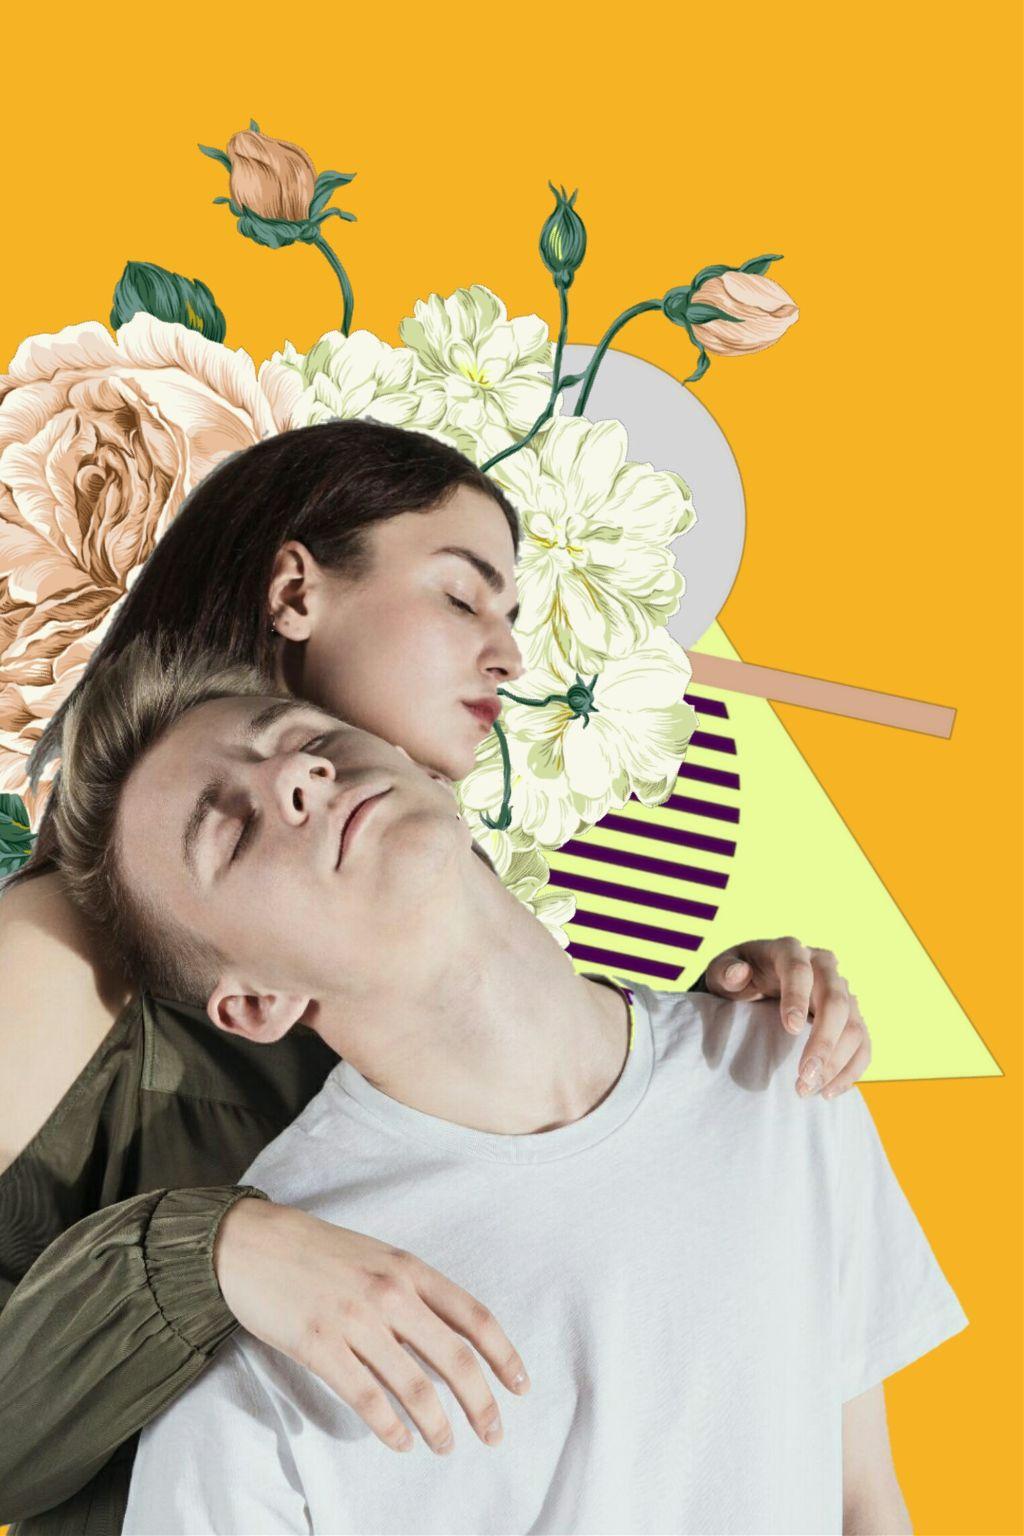 yellow  #freetoedit #flowers #couple #boy #girl #man #woman #circle #triangle #yellow flowerscrown